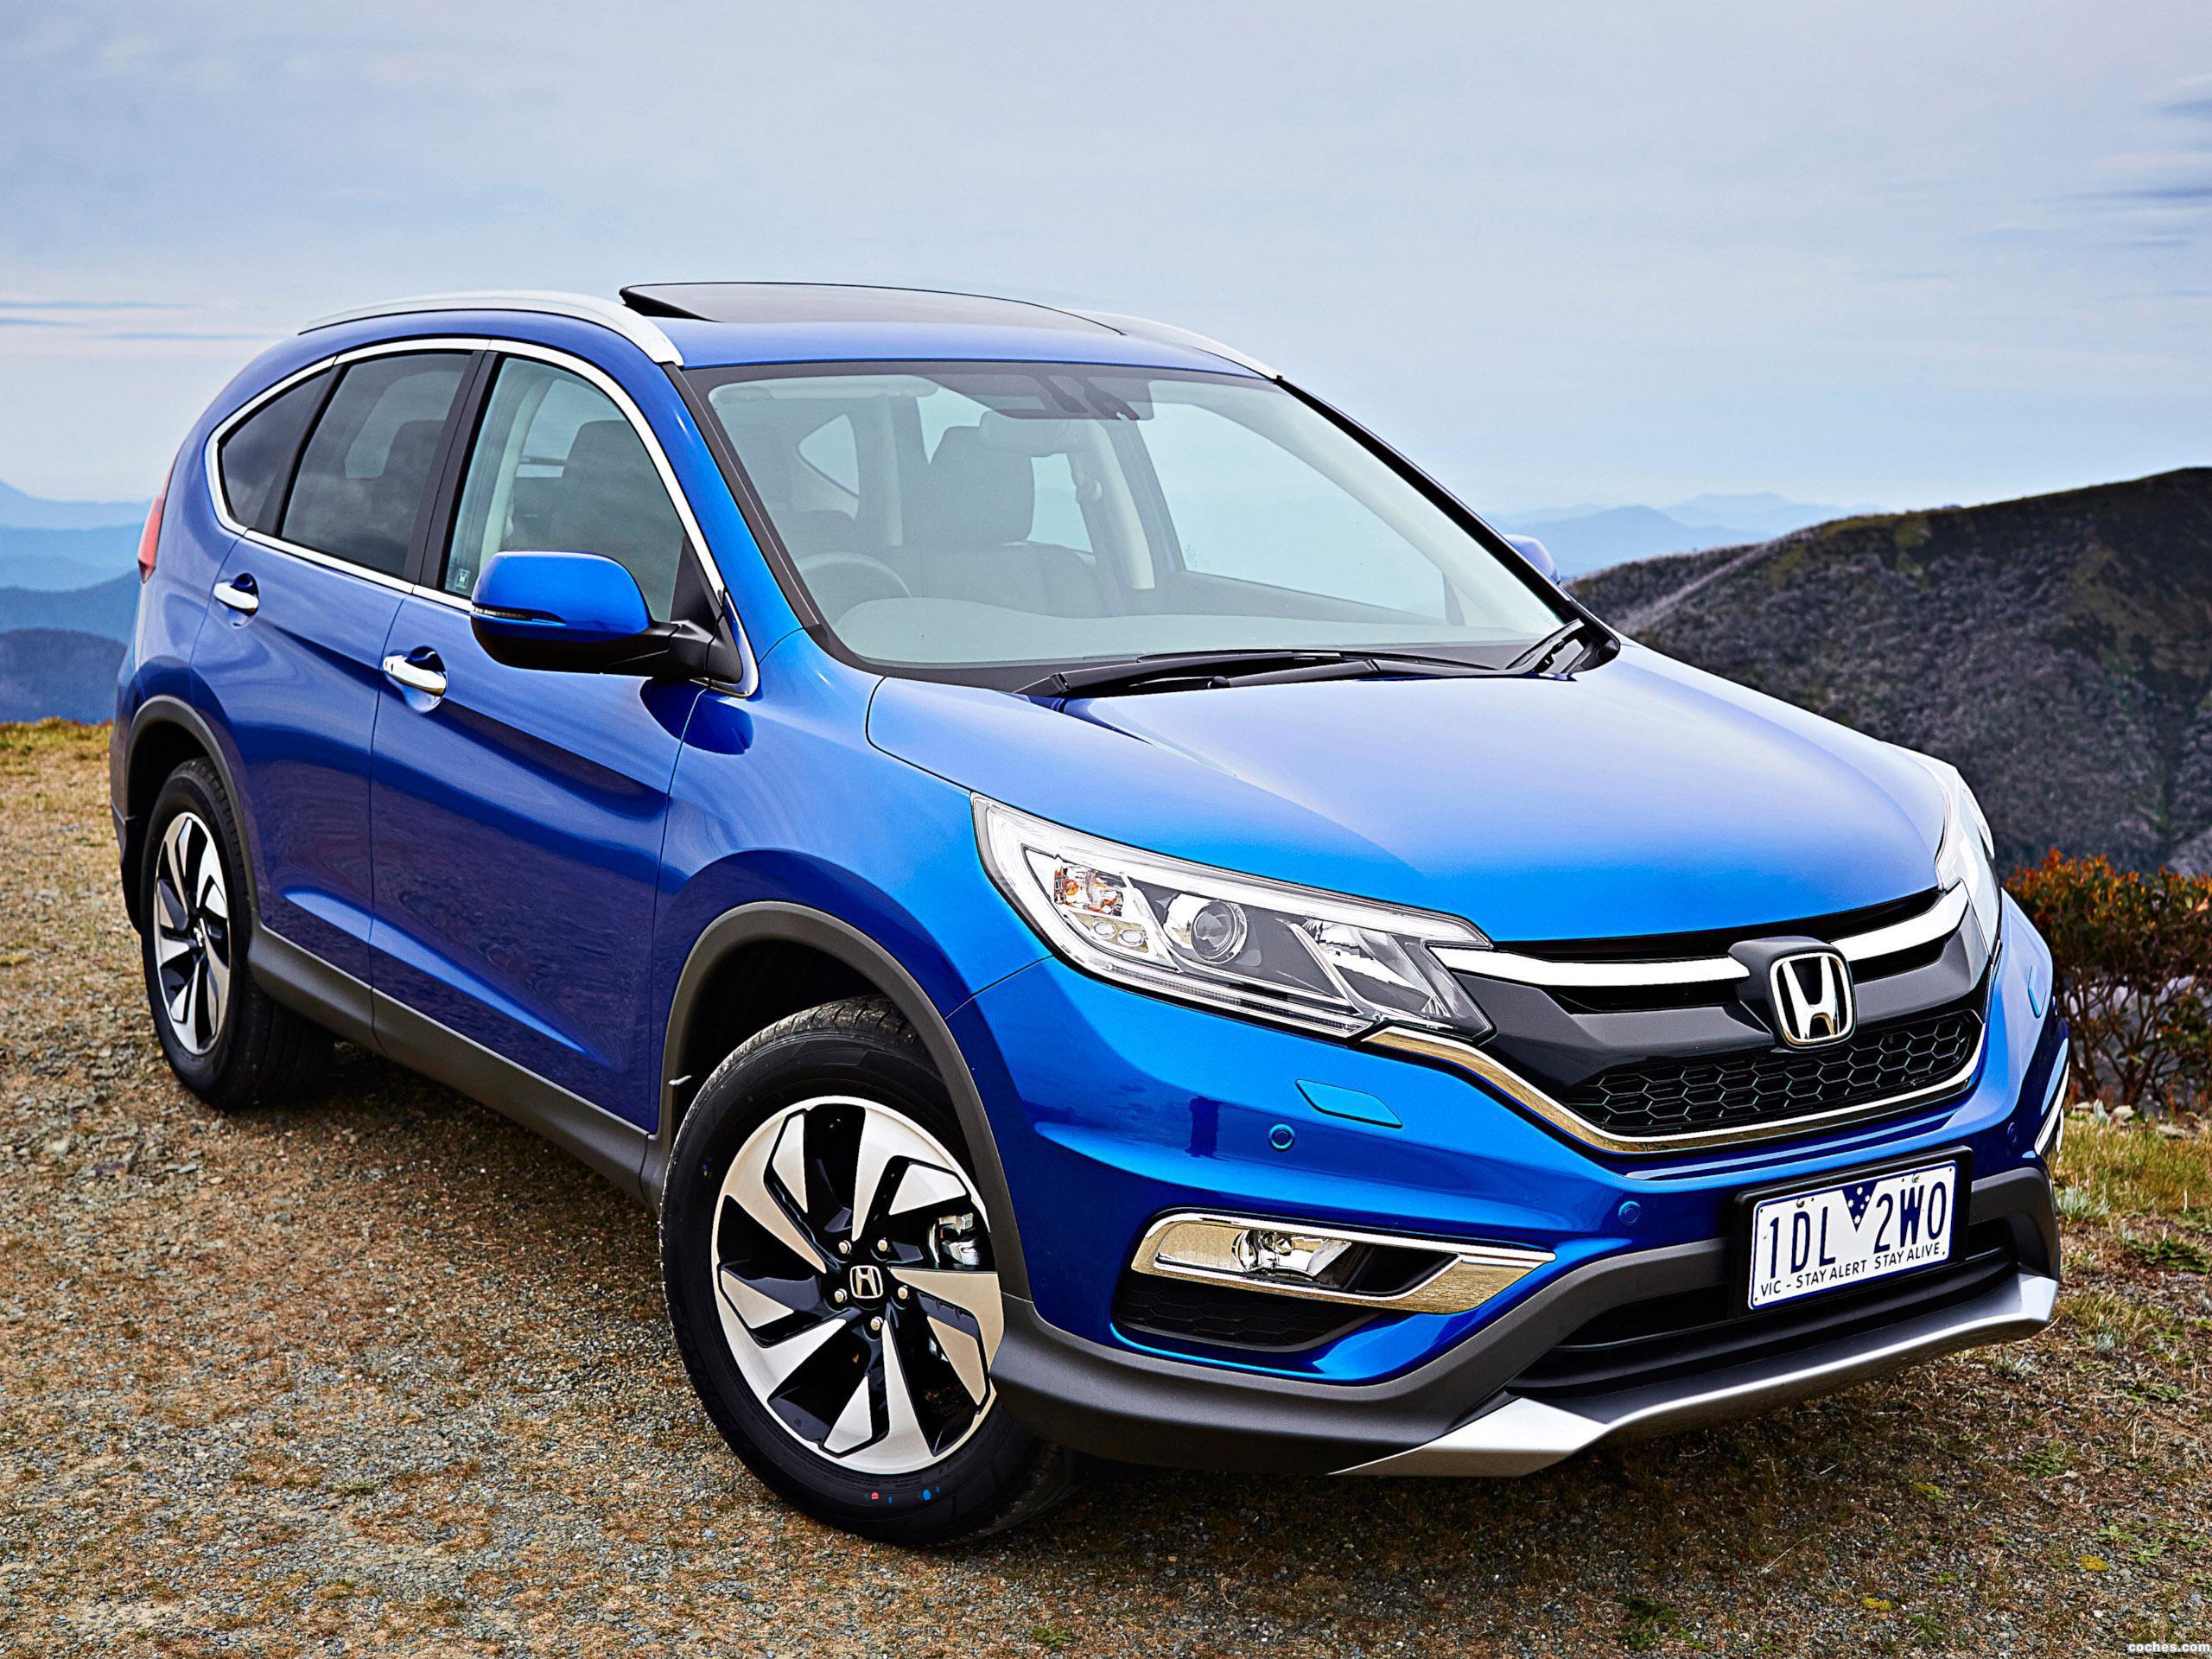 Foto 0 de Honda CR-V Australia 2014